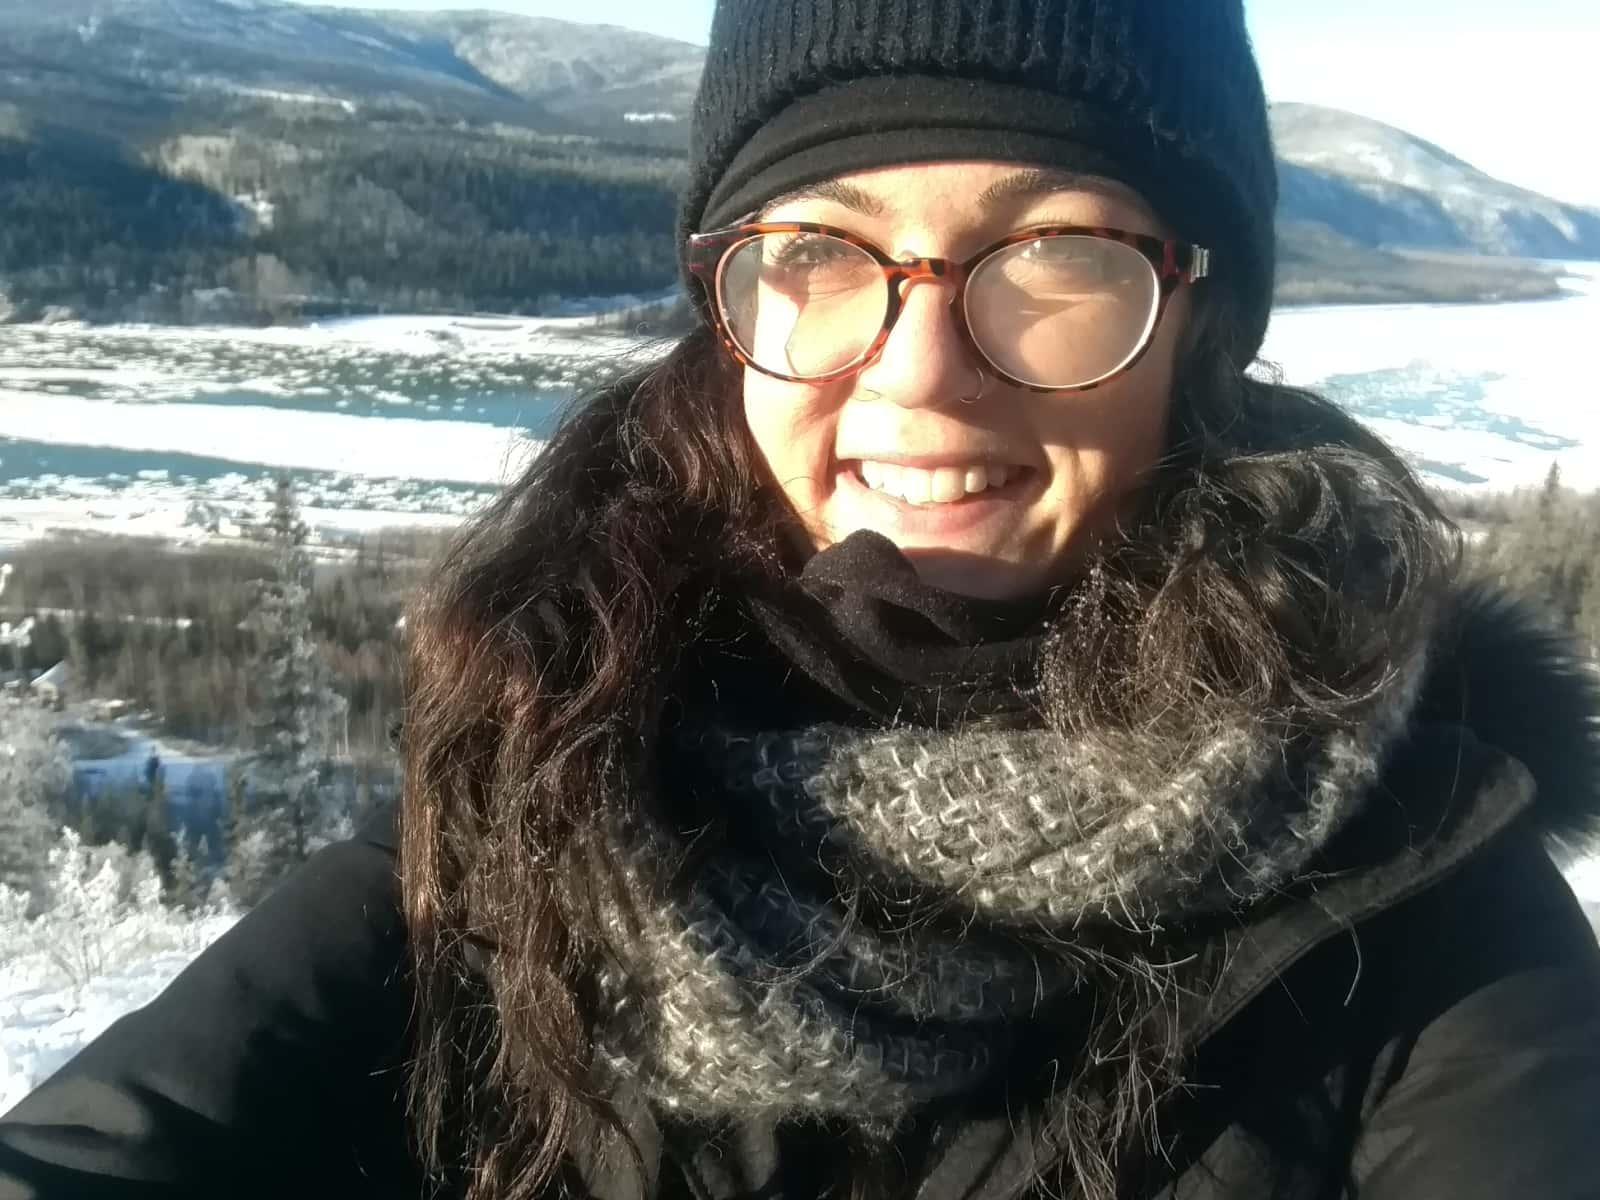 Alyson from Vancouver, British Columbia, Canada